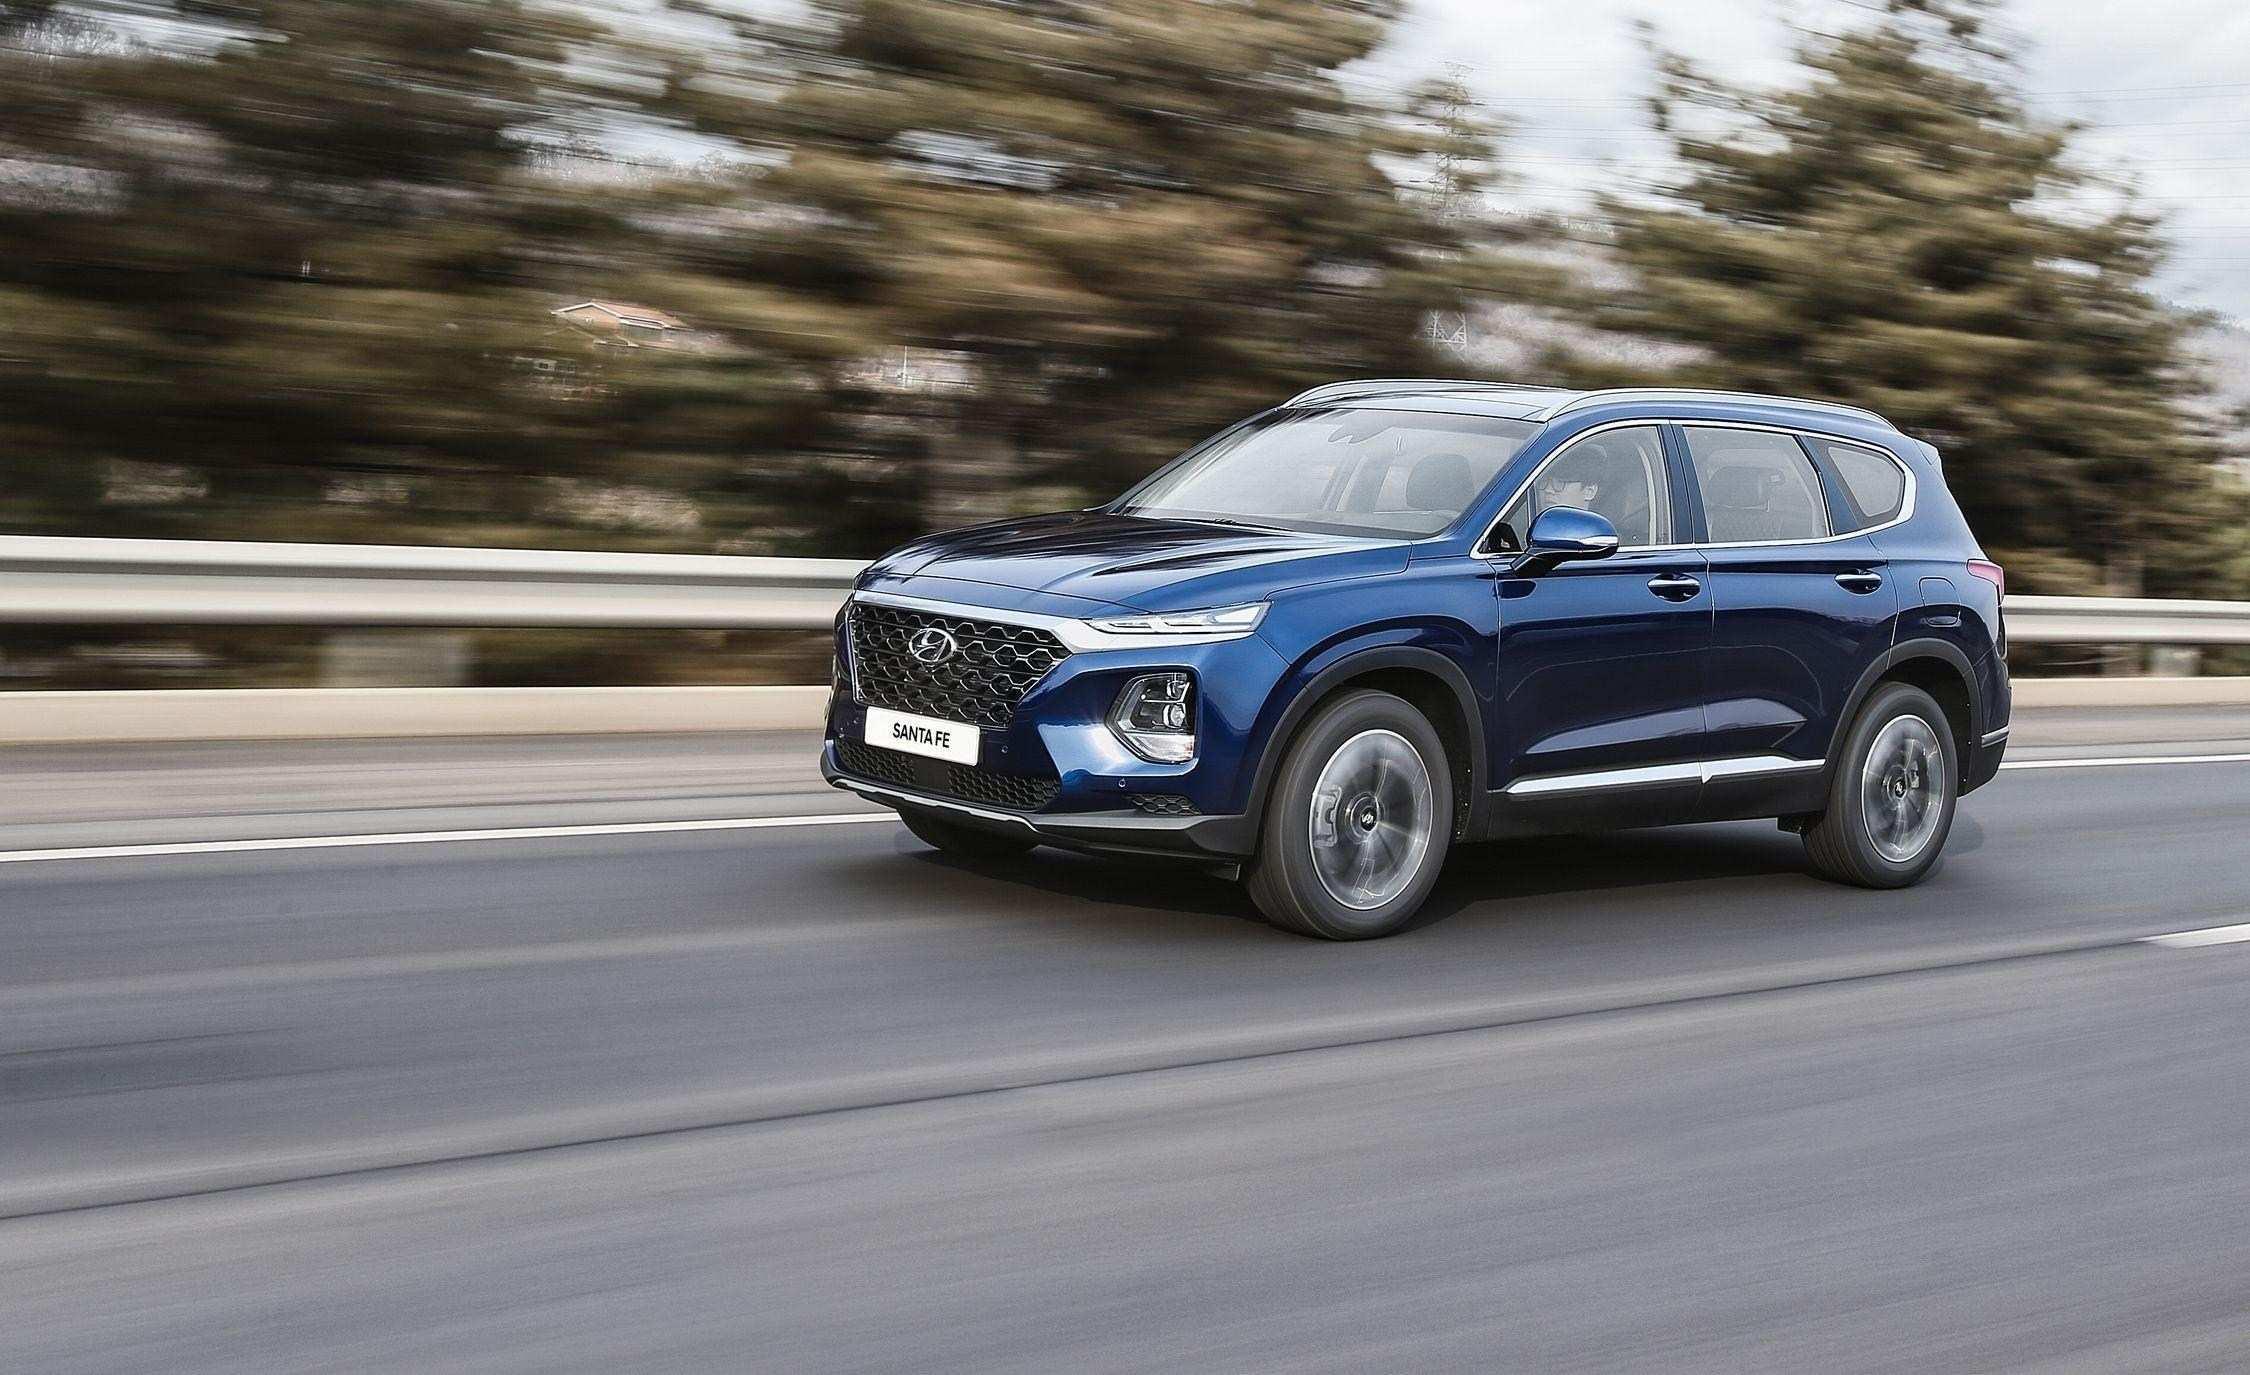 37 Great 2019 Hyundai Santa Fe Test Drive Redesign and Concept by 2019 Hyundai Santa Fe Test Drive